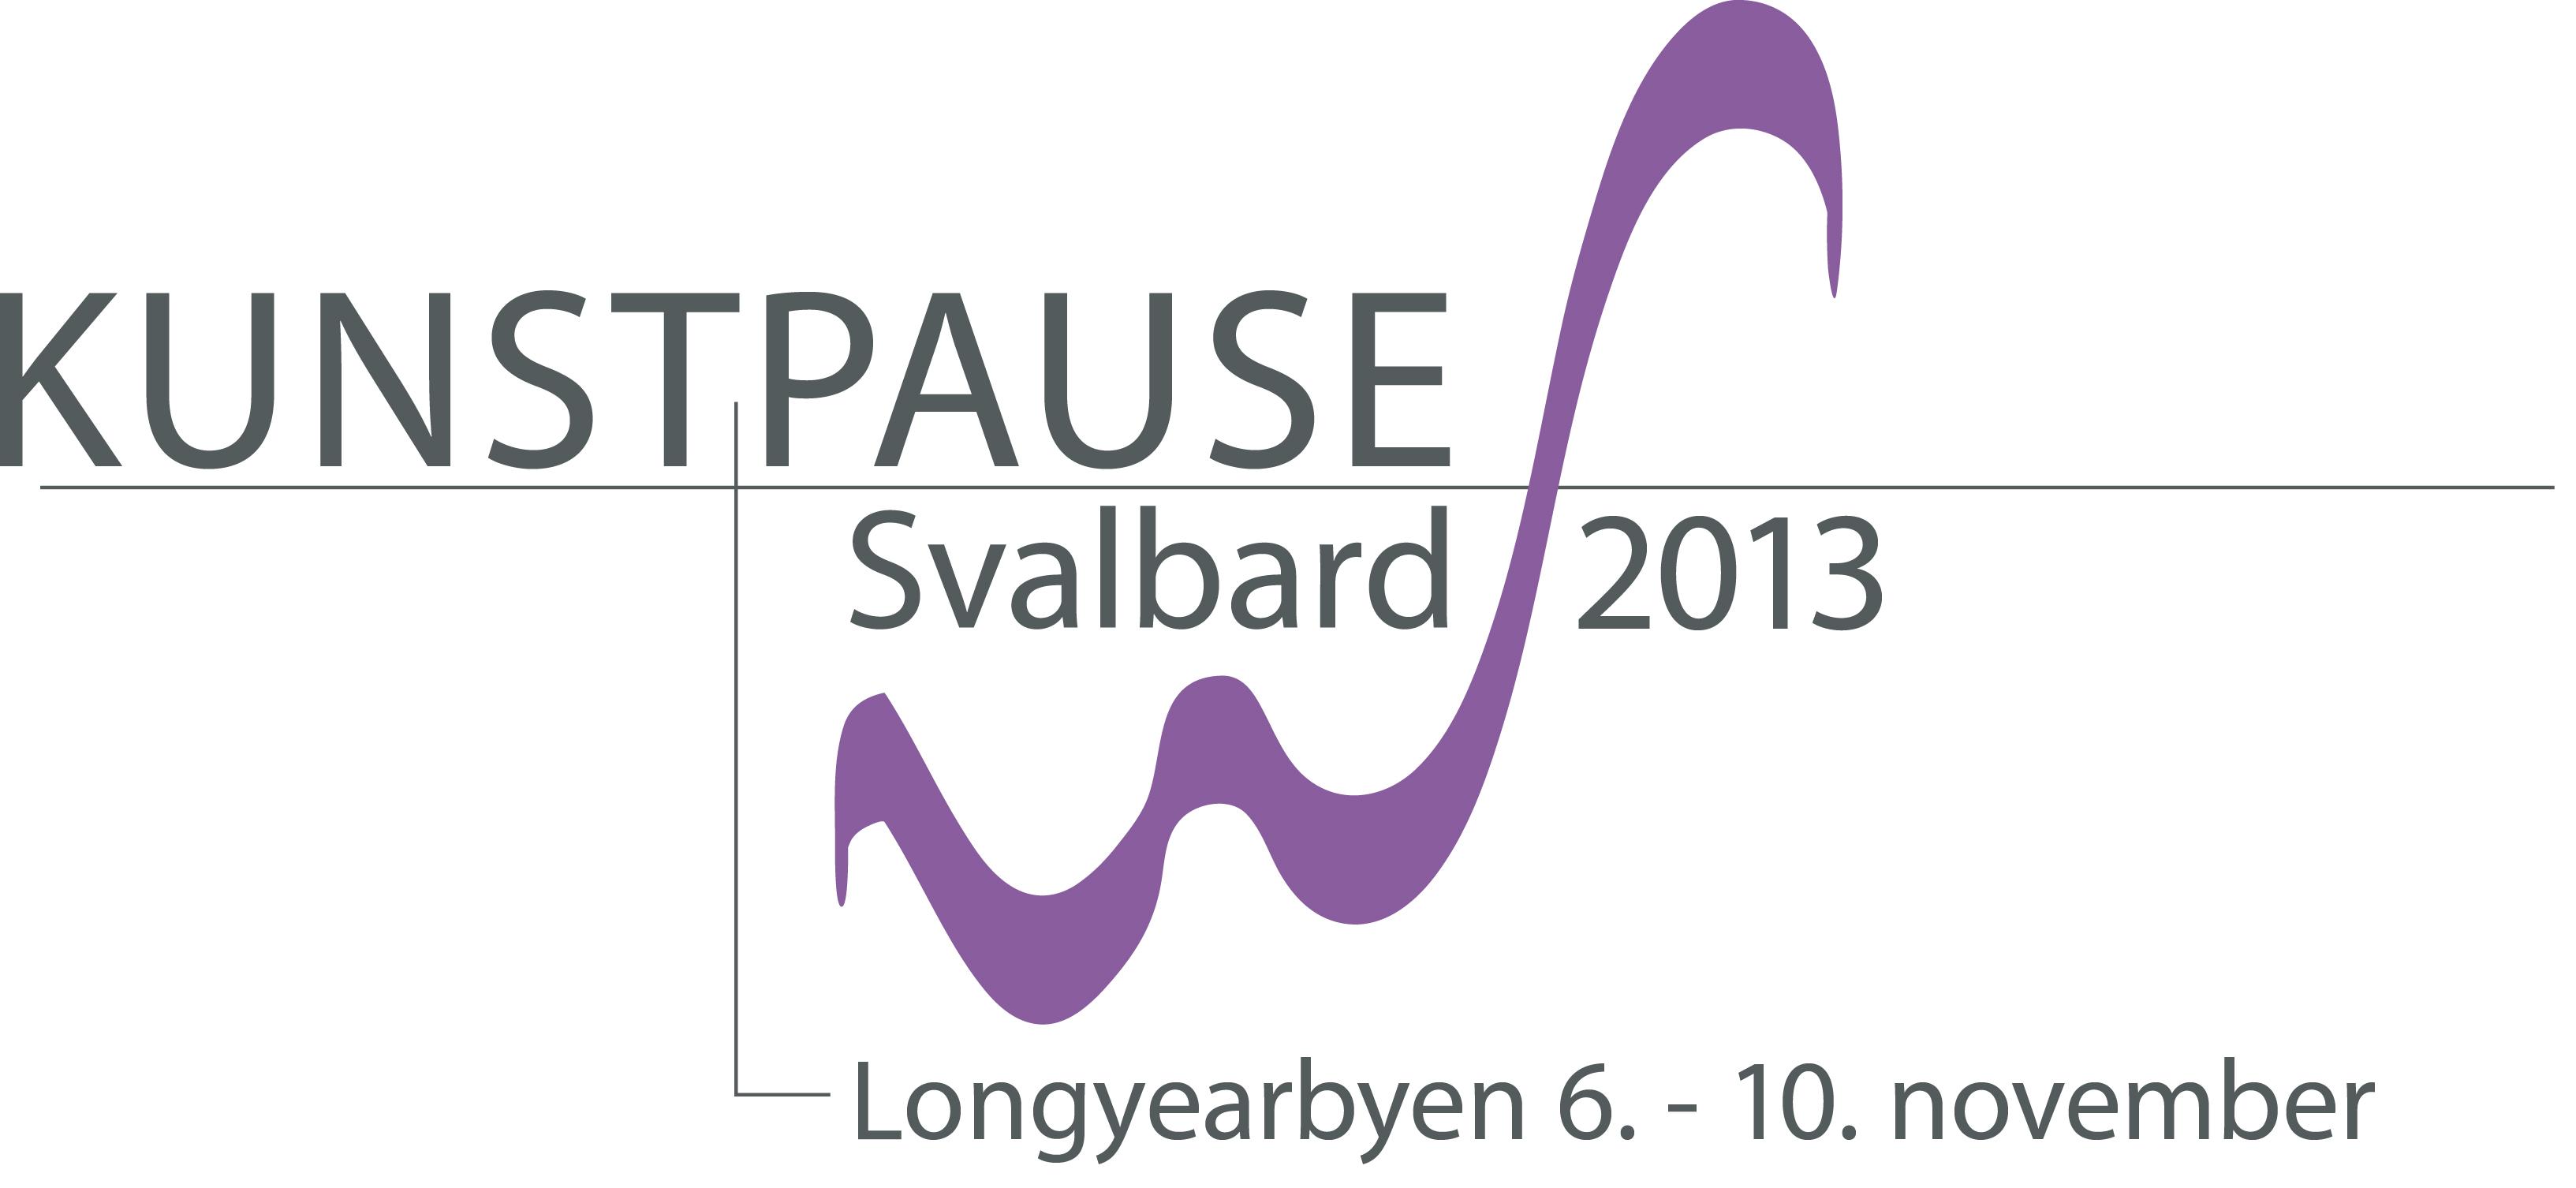 KunstPause Svalbard 2013 Logo.jpg